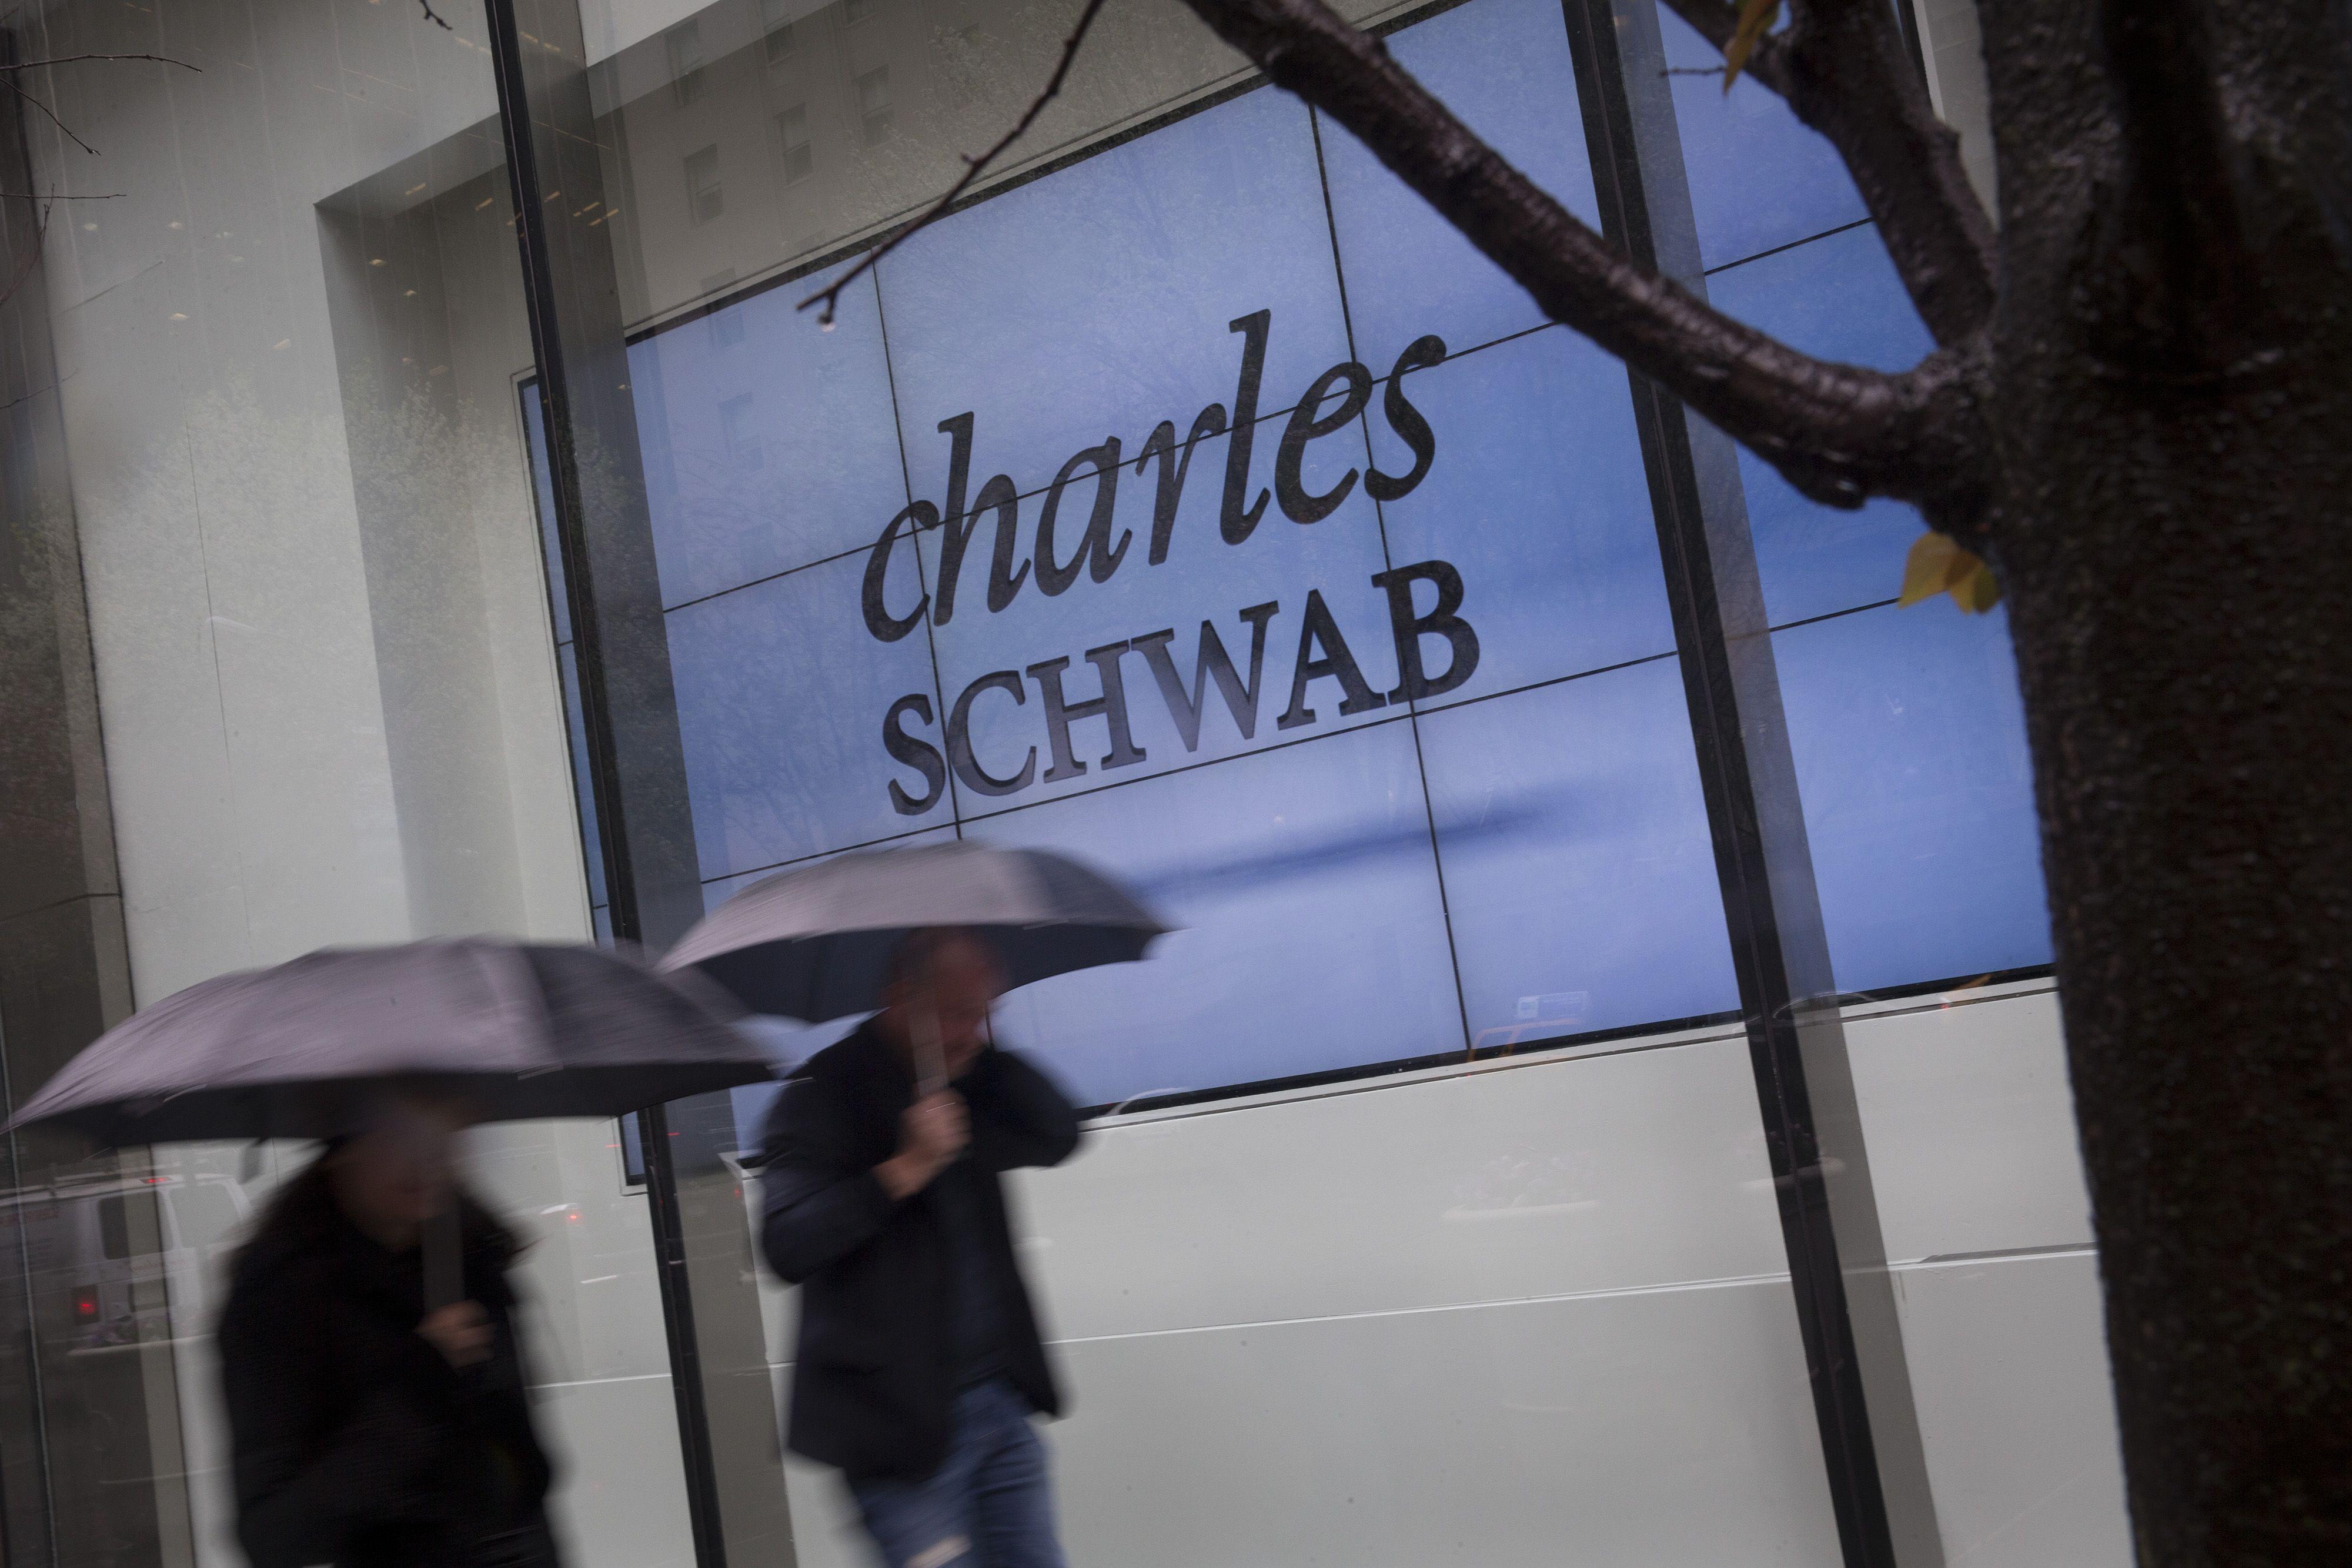 25 Best Stocks for 2015 Charles schwab, Online trading